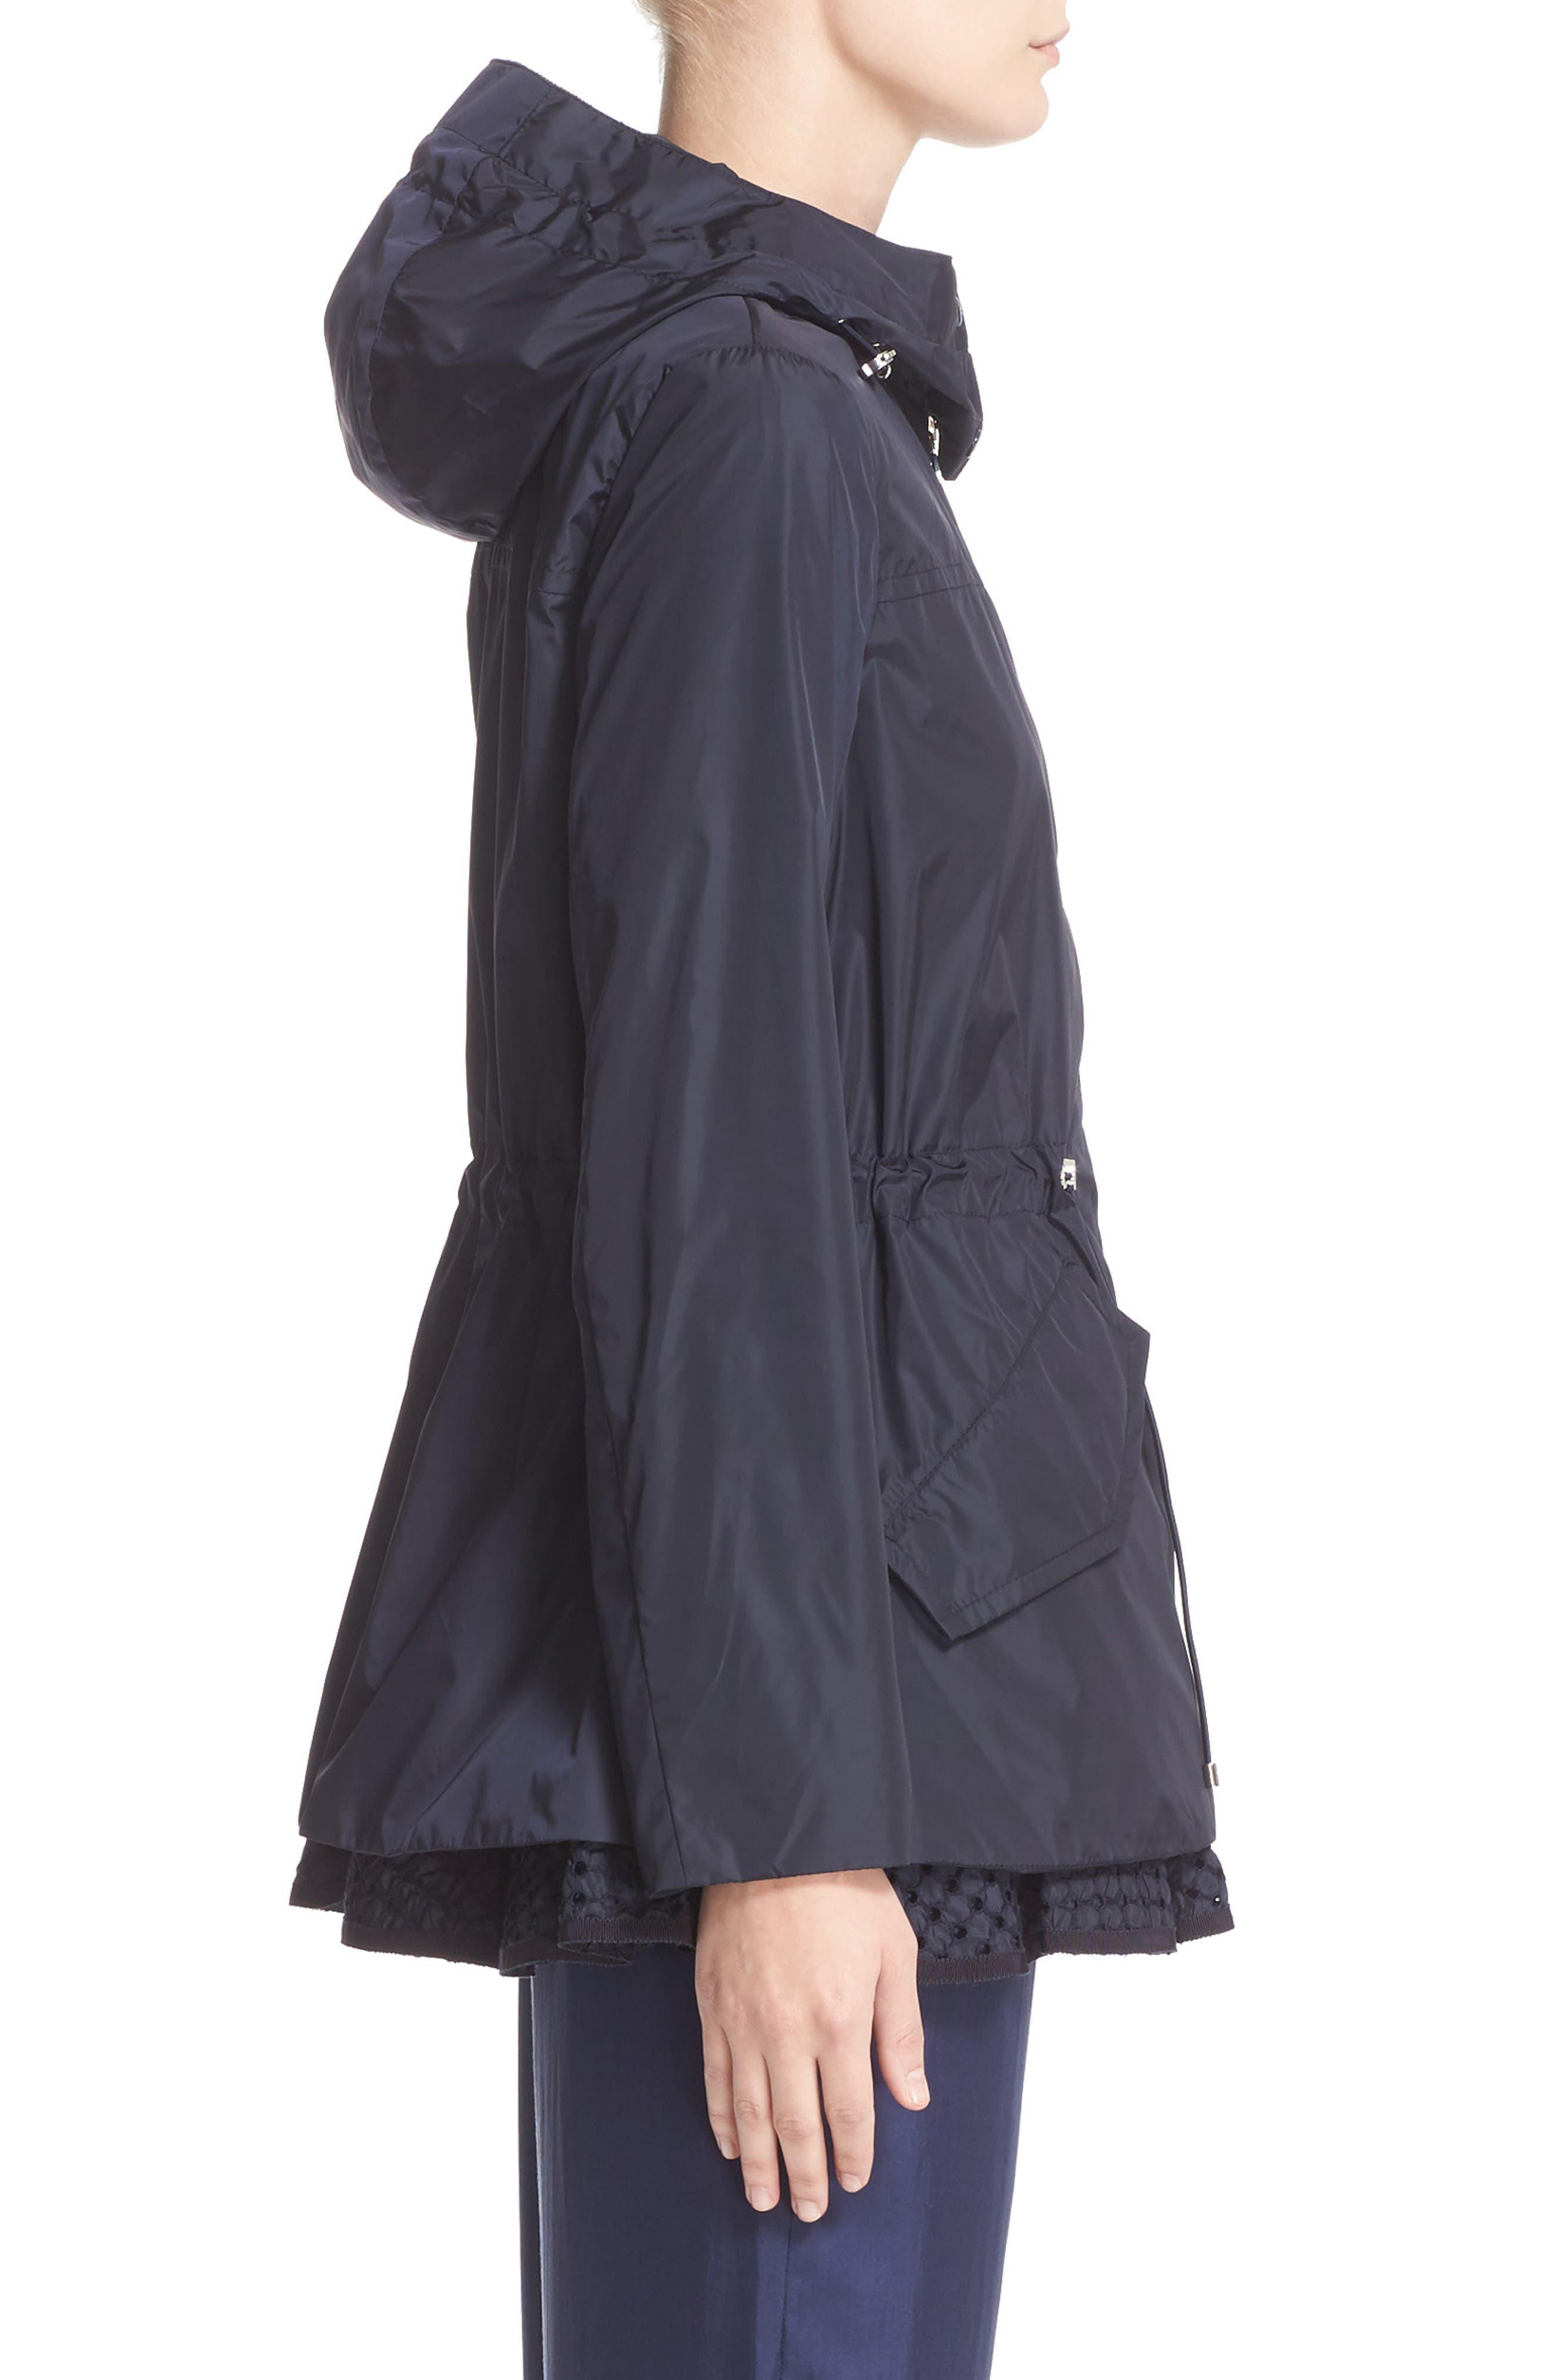 Lotus Water Resistant Peplum Raincoat,                             Alternate thumbnail 5, color,                             Navy